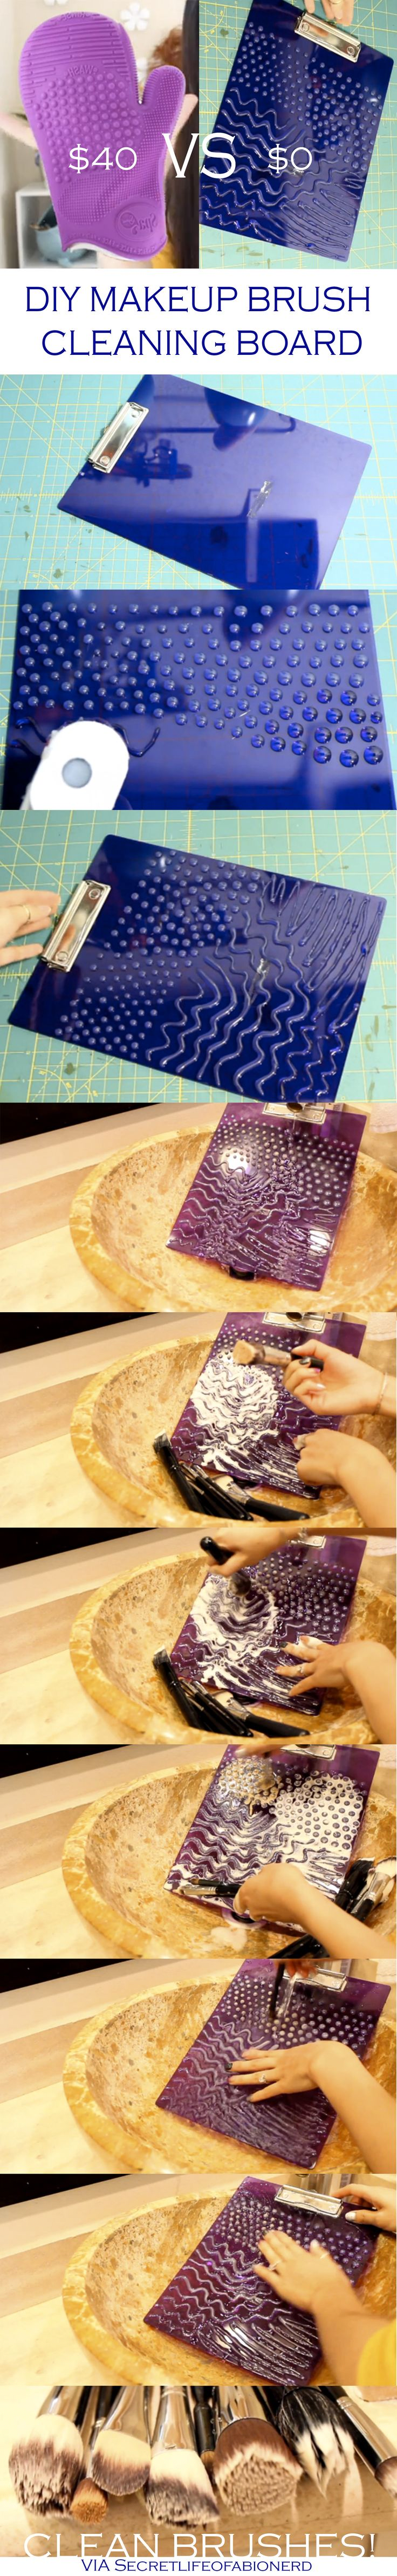 DIY Makeup Brush Cleaning Board - Via SecretLifeOfaBioNerd http://www.youtube.com/watch?v=Zeefo2wZ14k